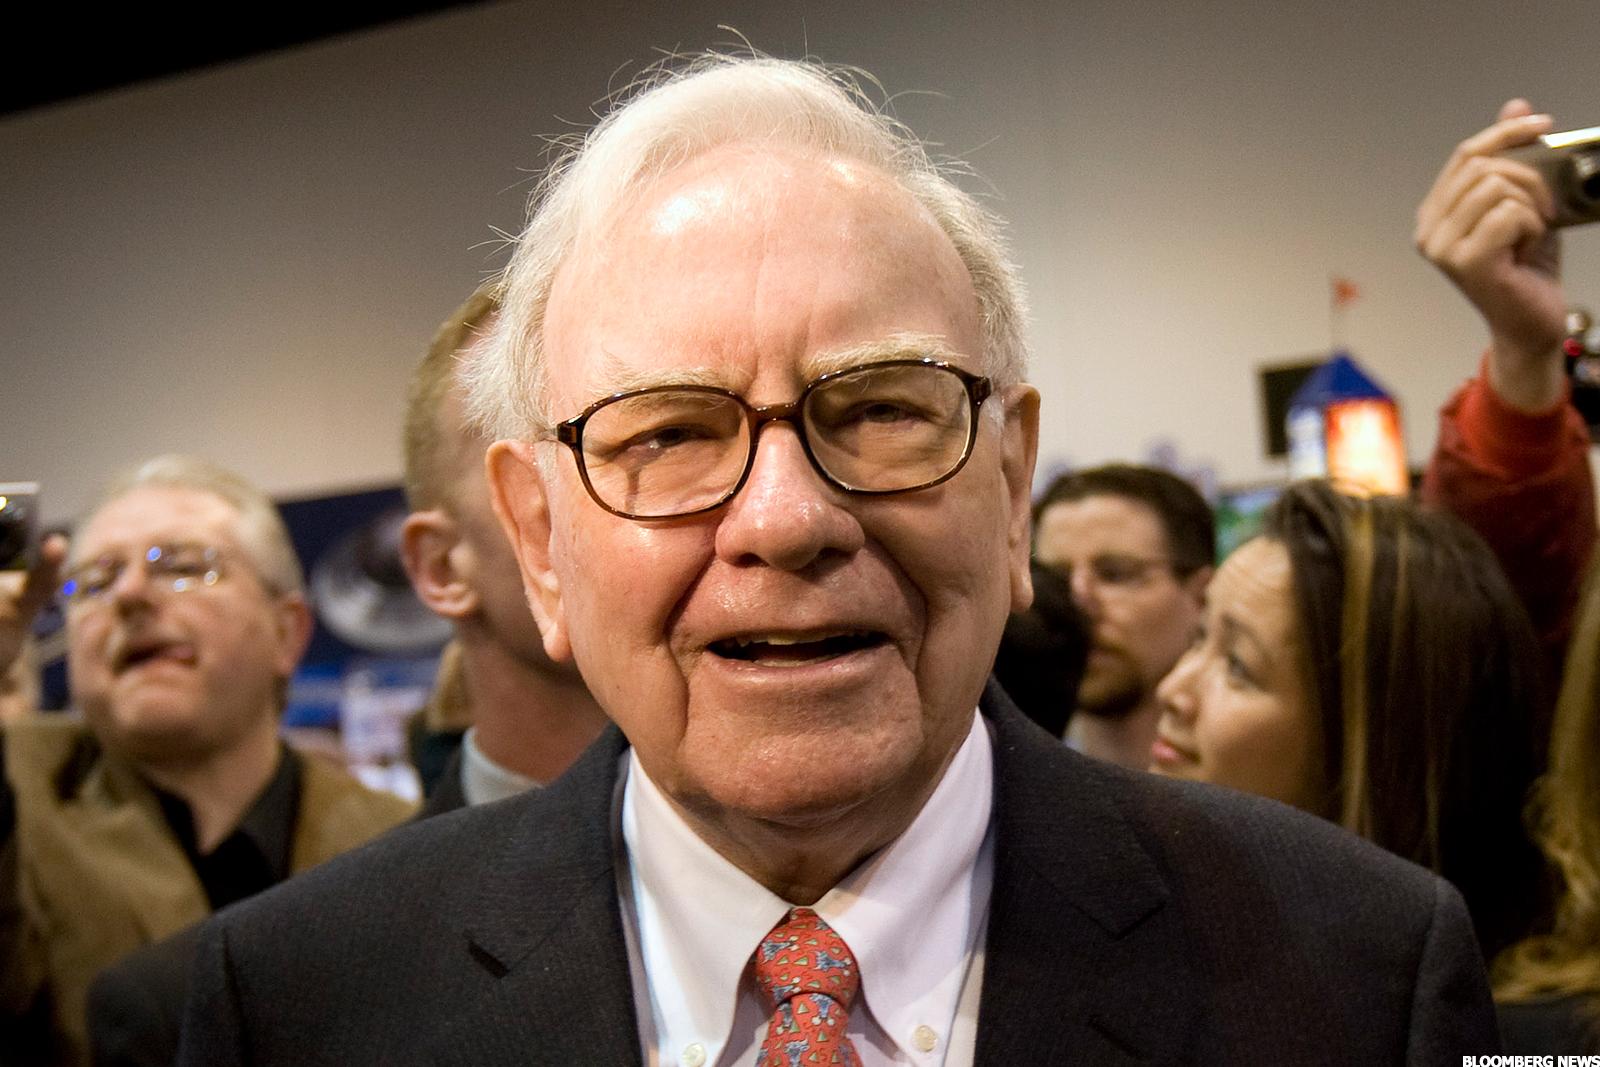 warren buffett Warren buffett didn't have much luck in the blockbuster-deals department last year, but his real estate brokerage business is on a tear.